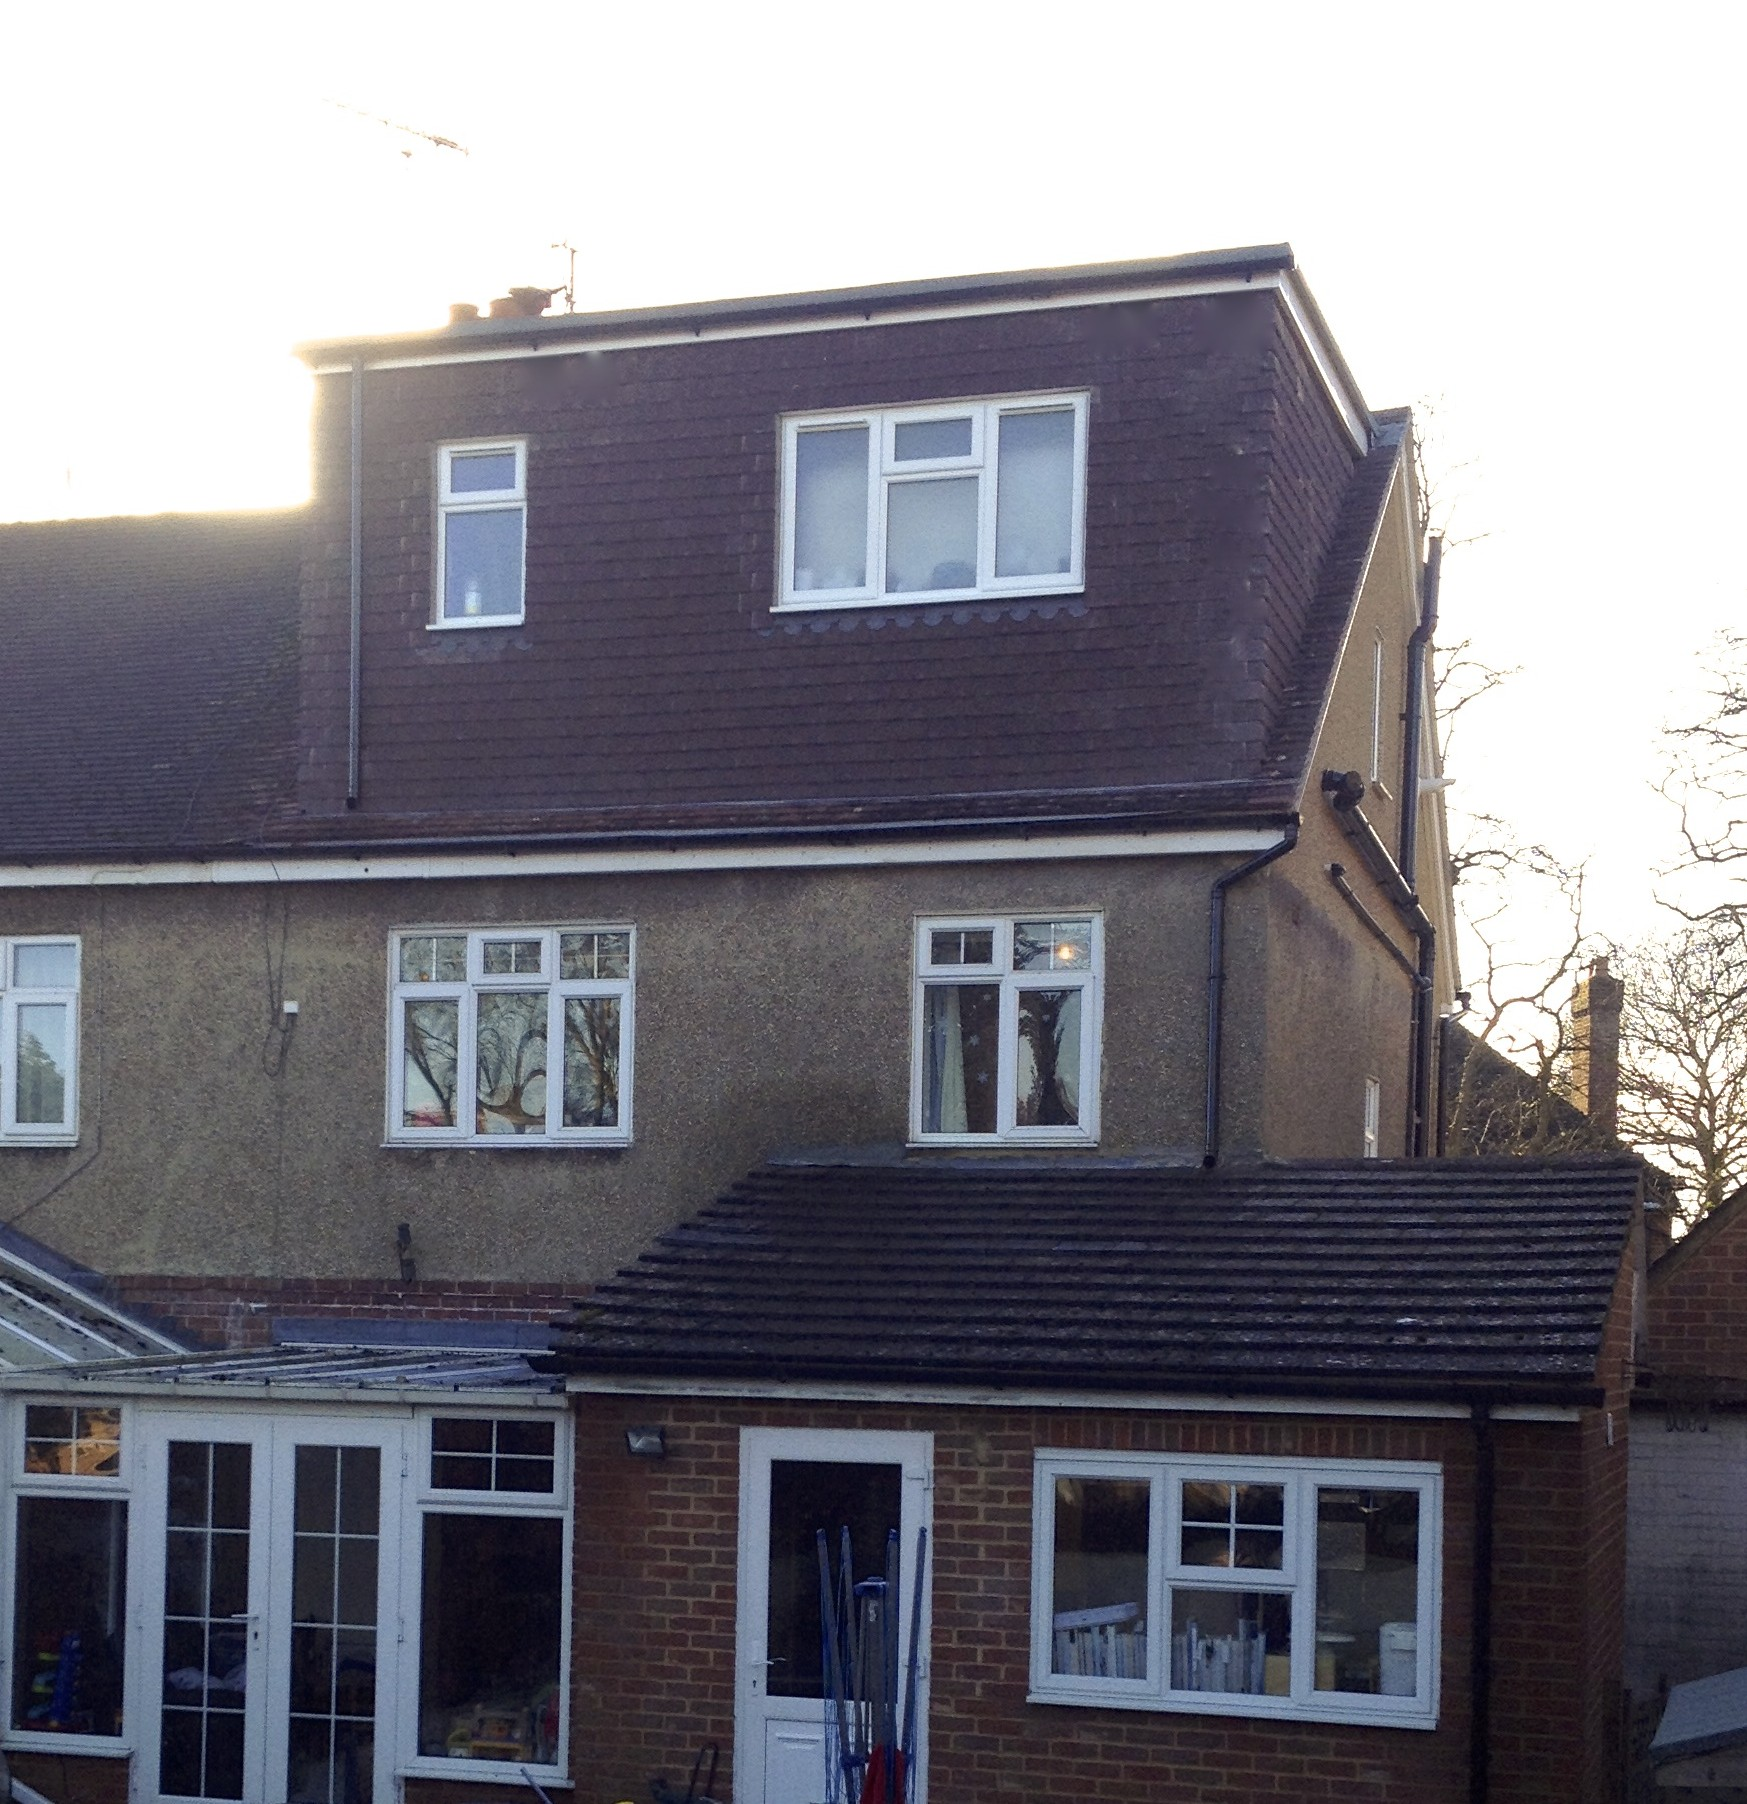 attic floor plan ideas - Terraced House Loft Conversion Options SkyLofts